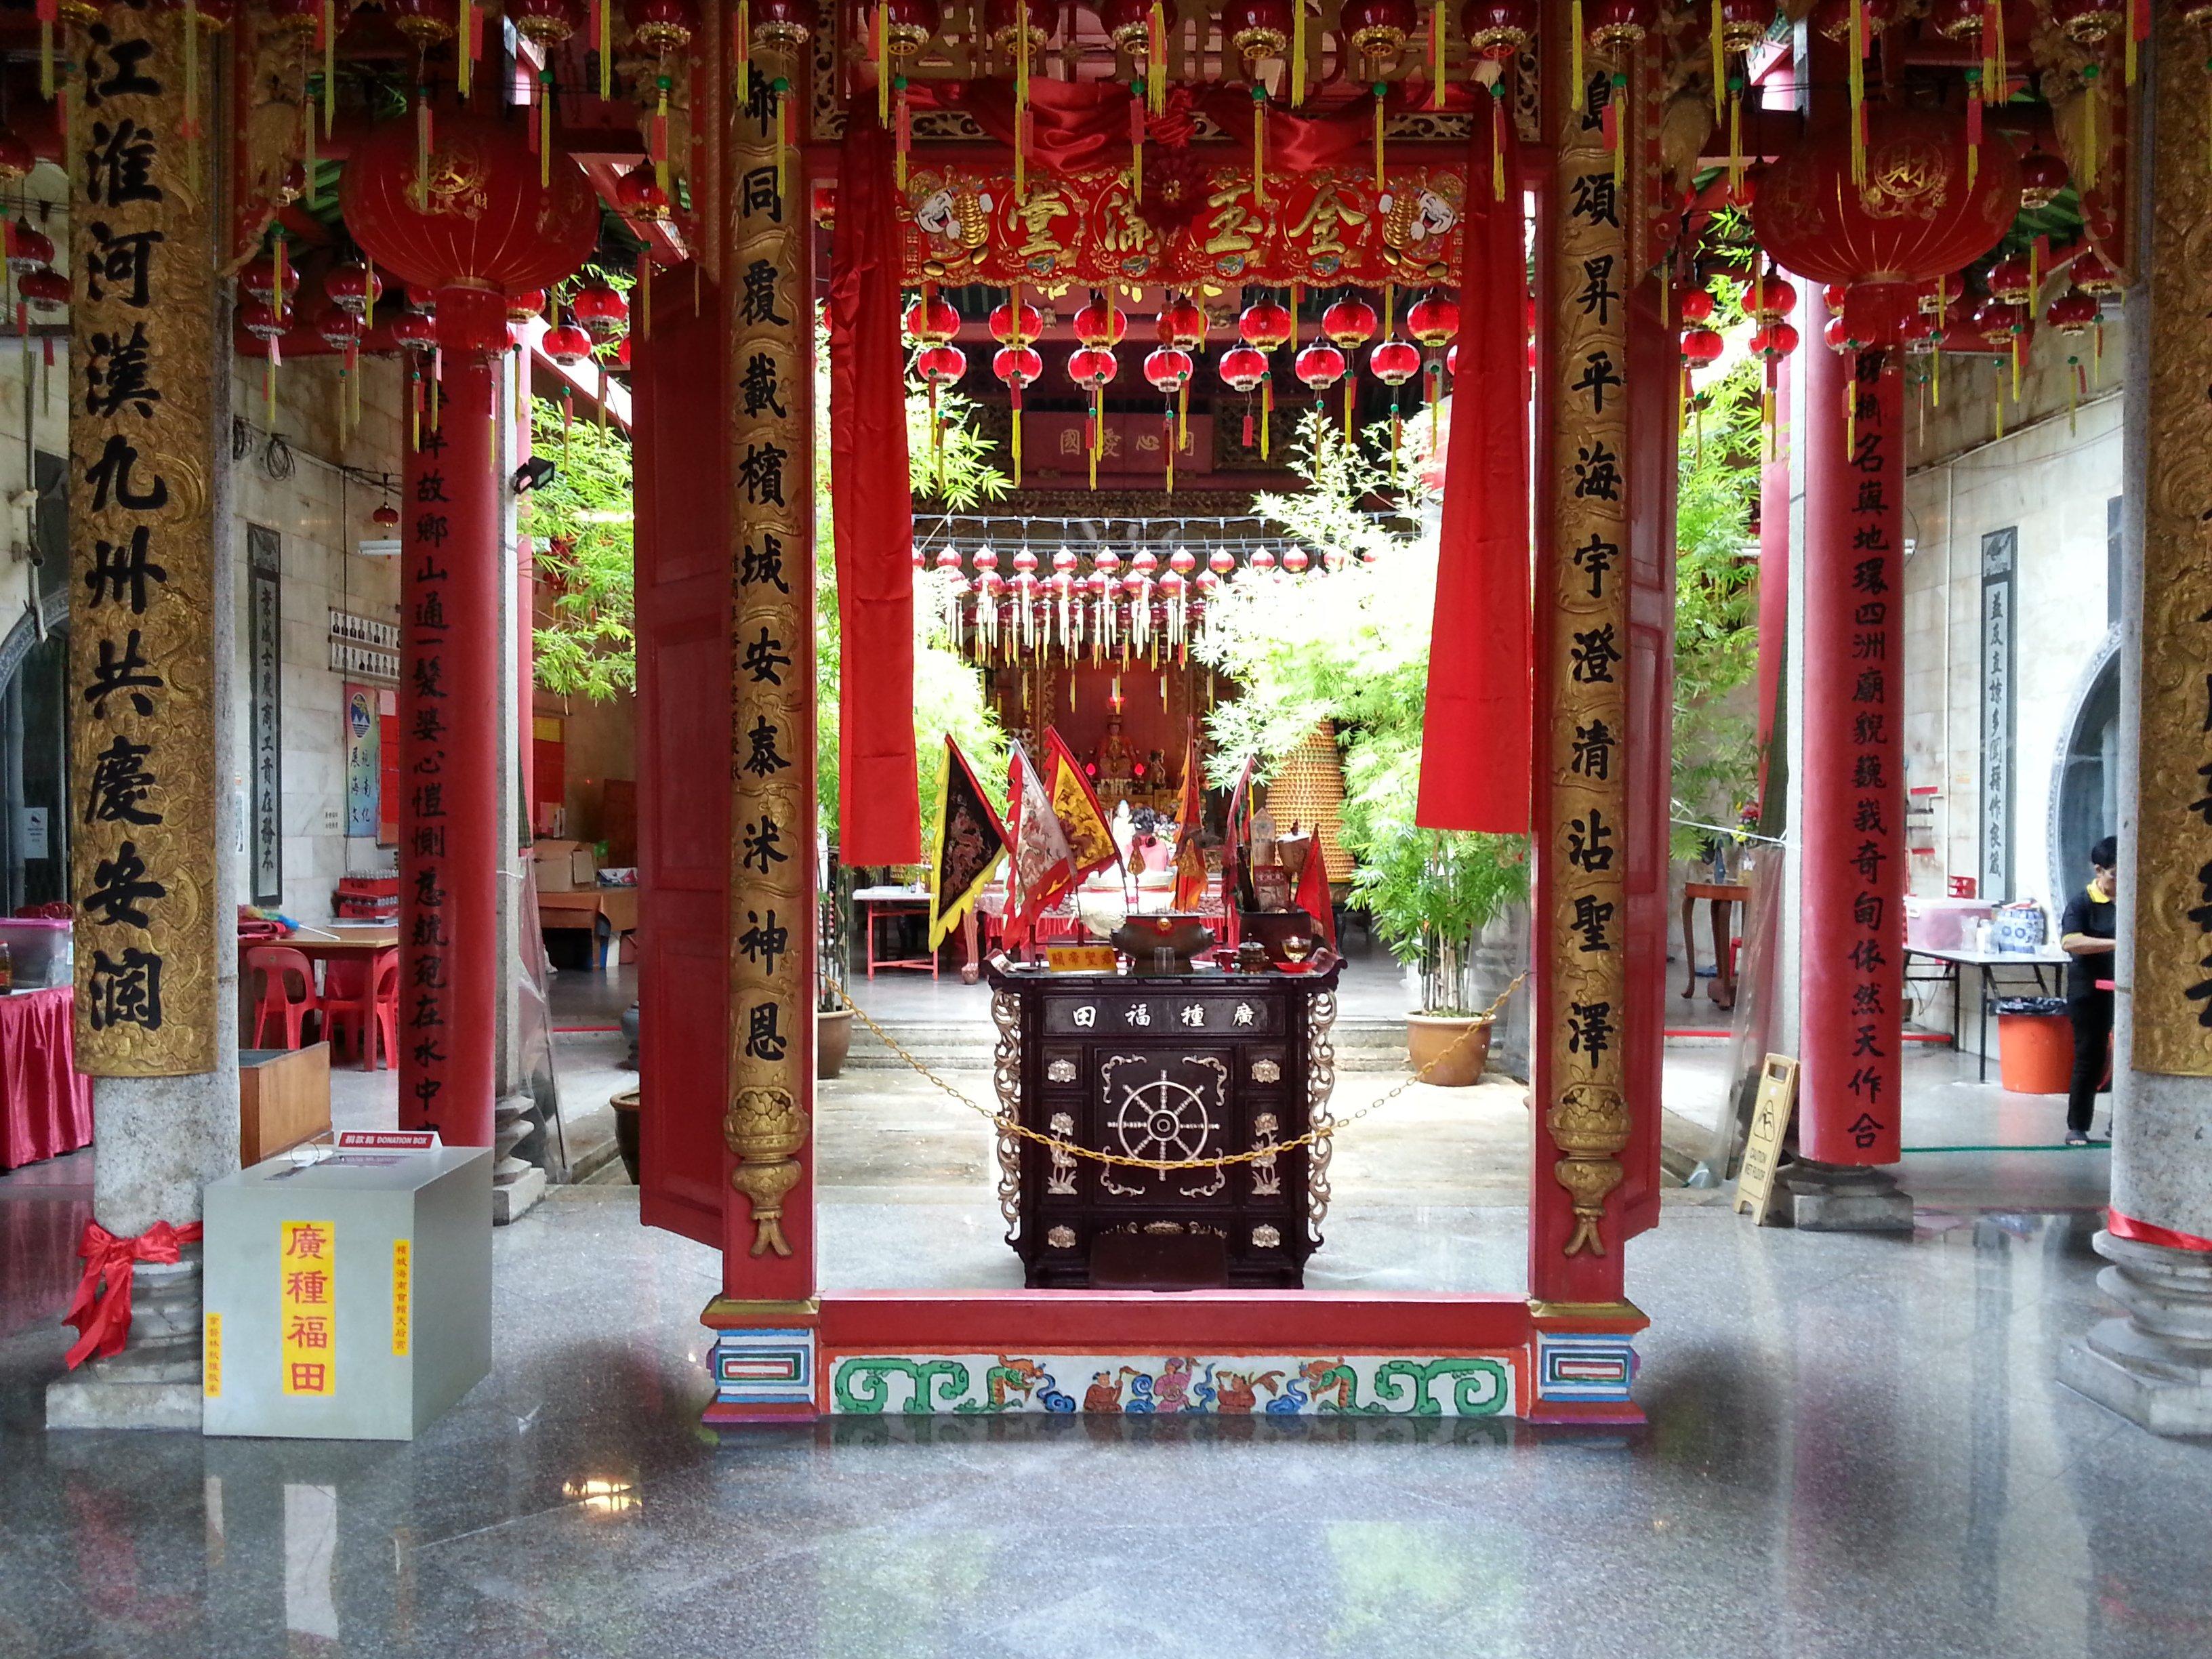 Inside the Hainan Temple on Muntri Street